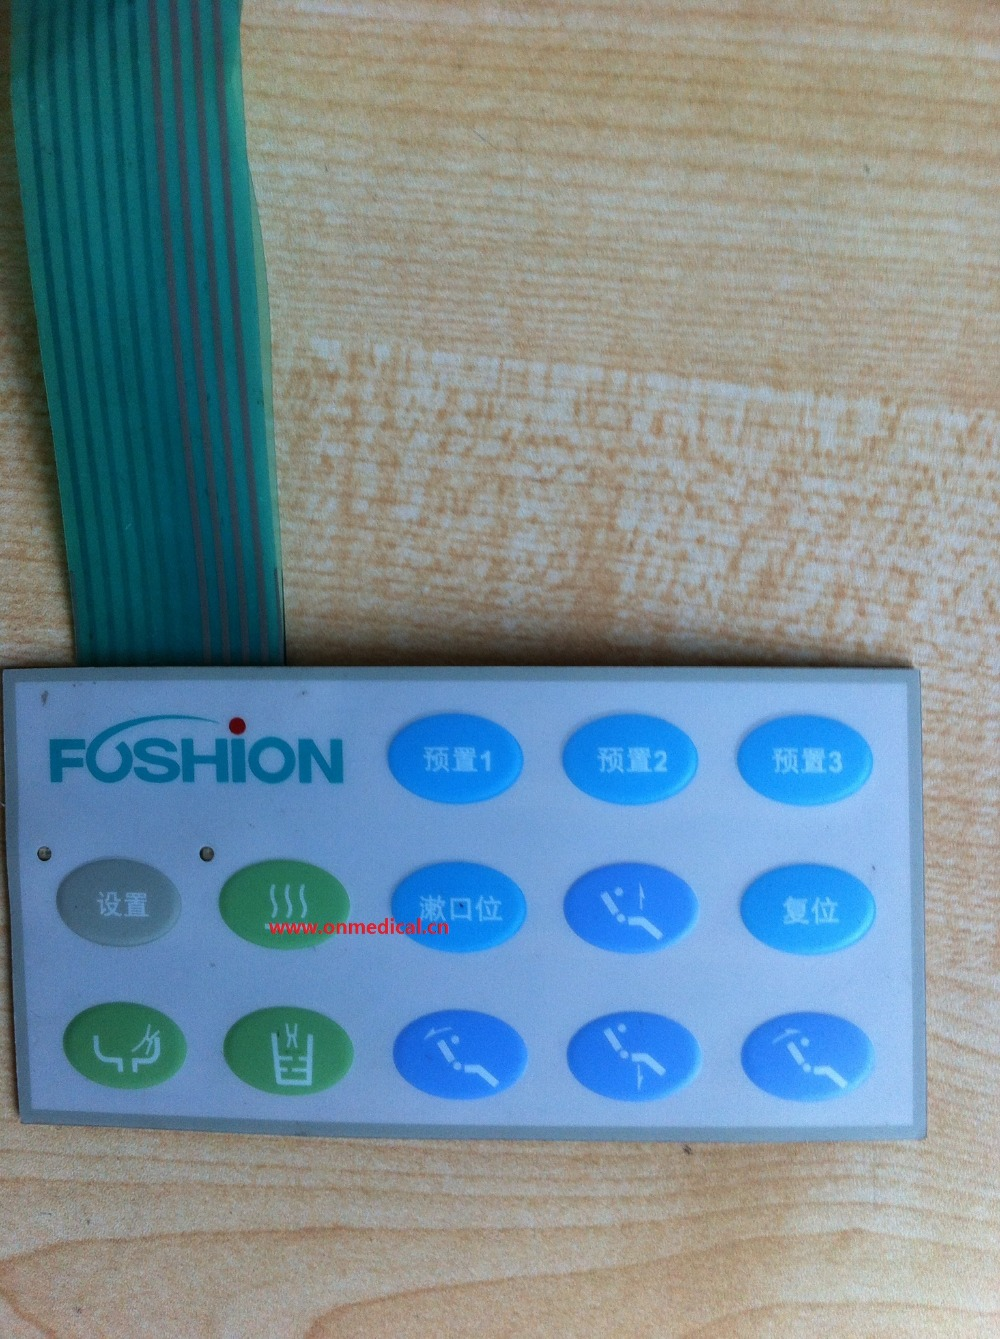 Dental Chair Foshion FJ22 FJ24 Use Master Control KeyBoard Circuit Board dental chair foshion fj24j use master control keyboard circuit board